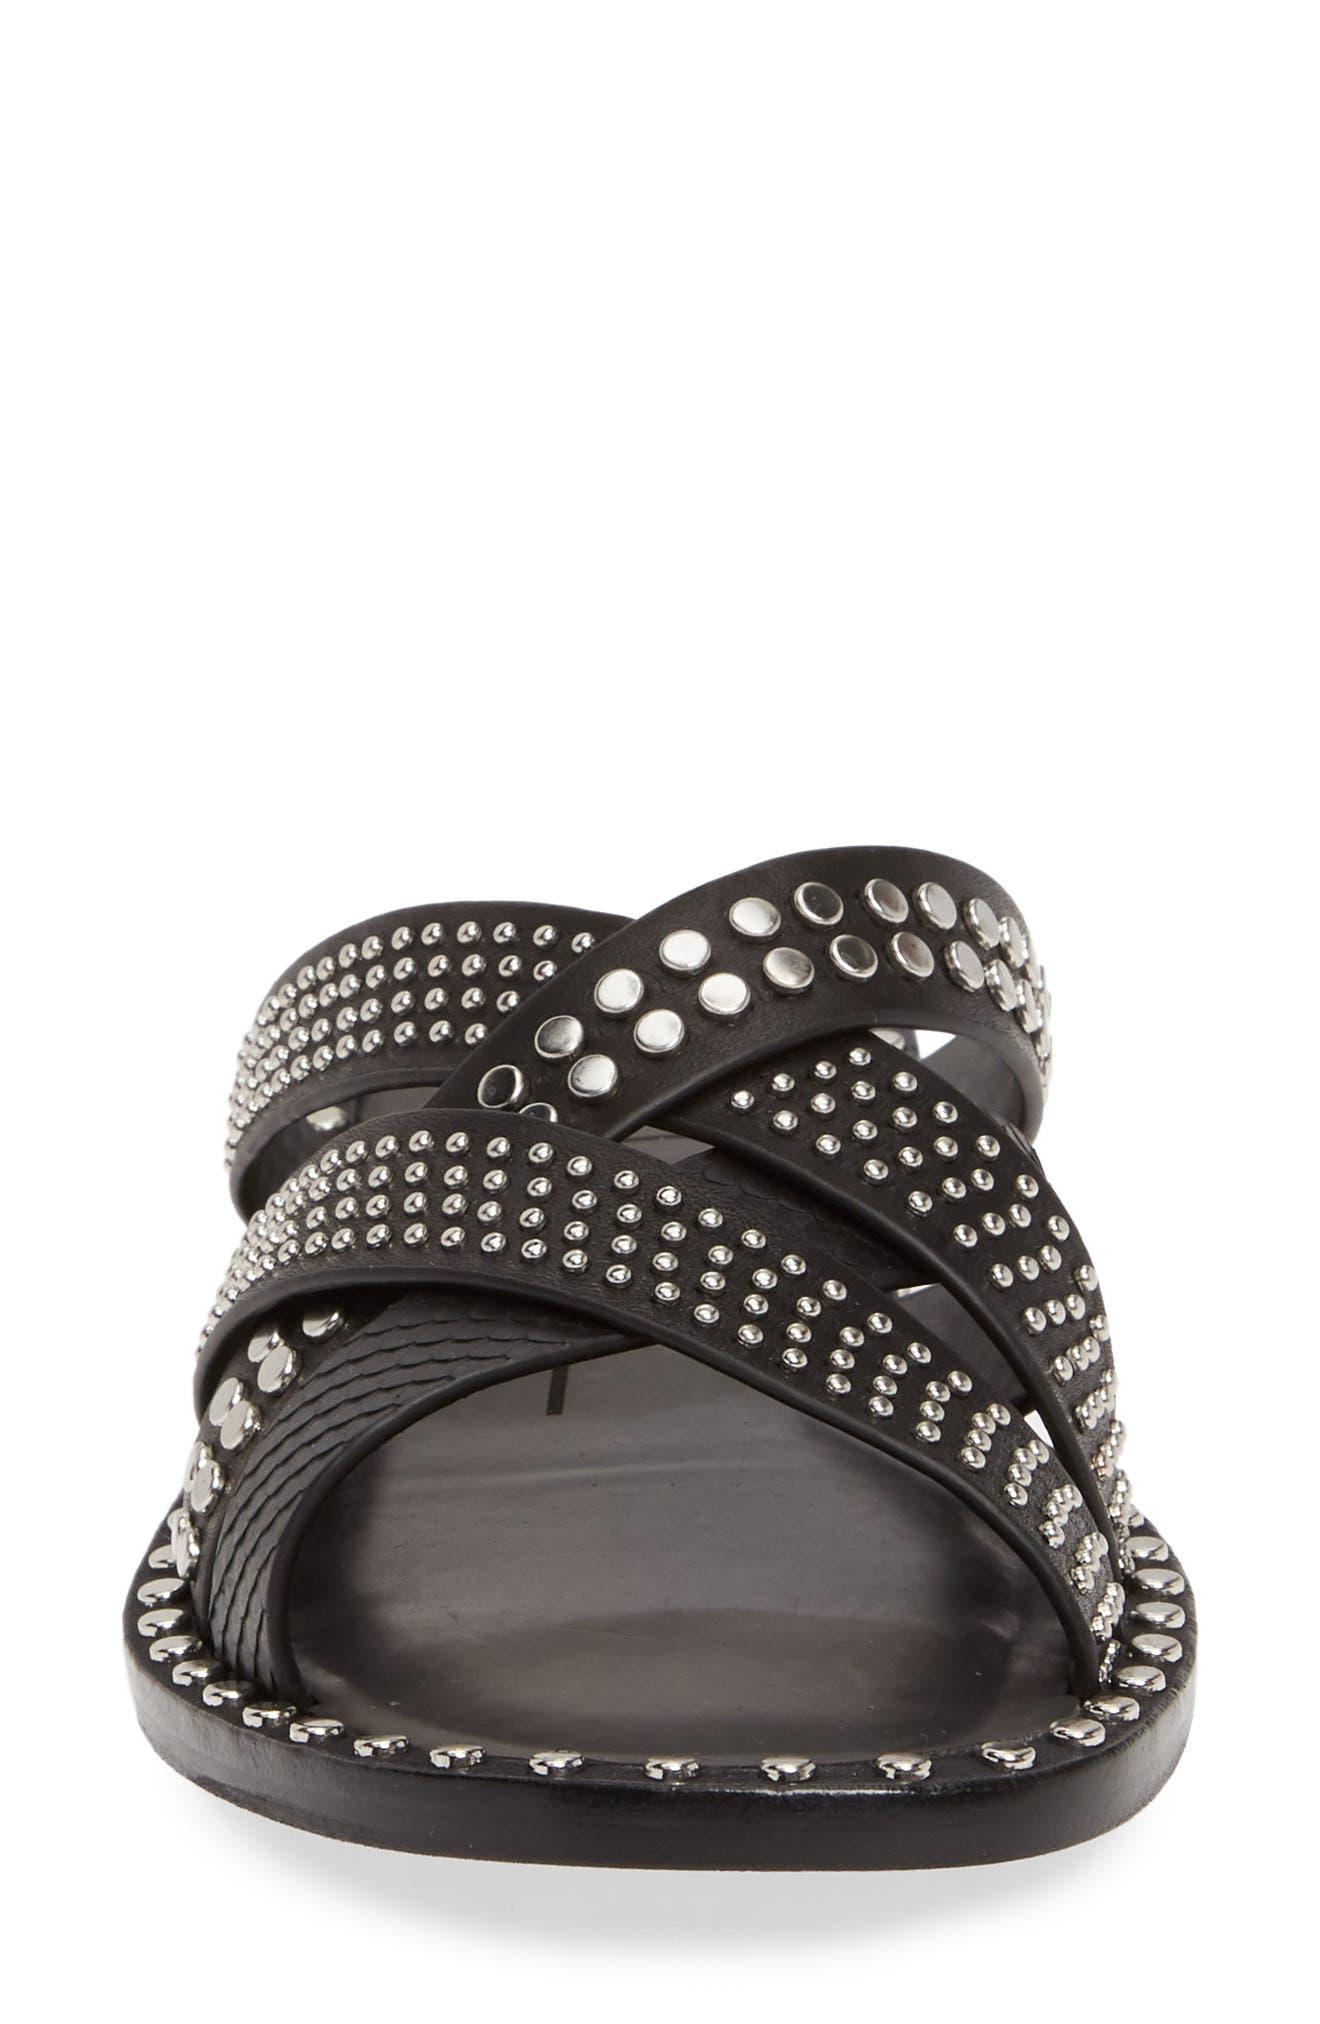 DOLCE VITA, Corbey Studded Slide Sandal, Alternate thumbnail 4, color, BLACK LEATHER